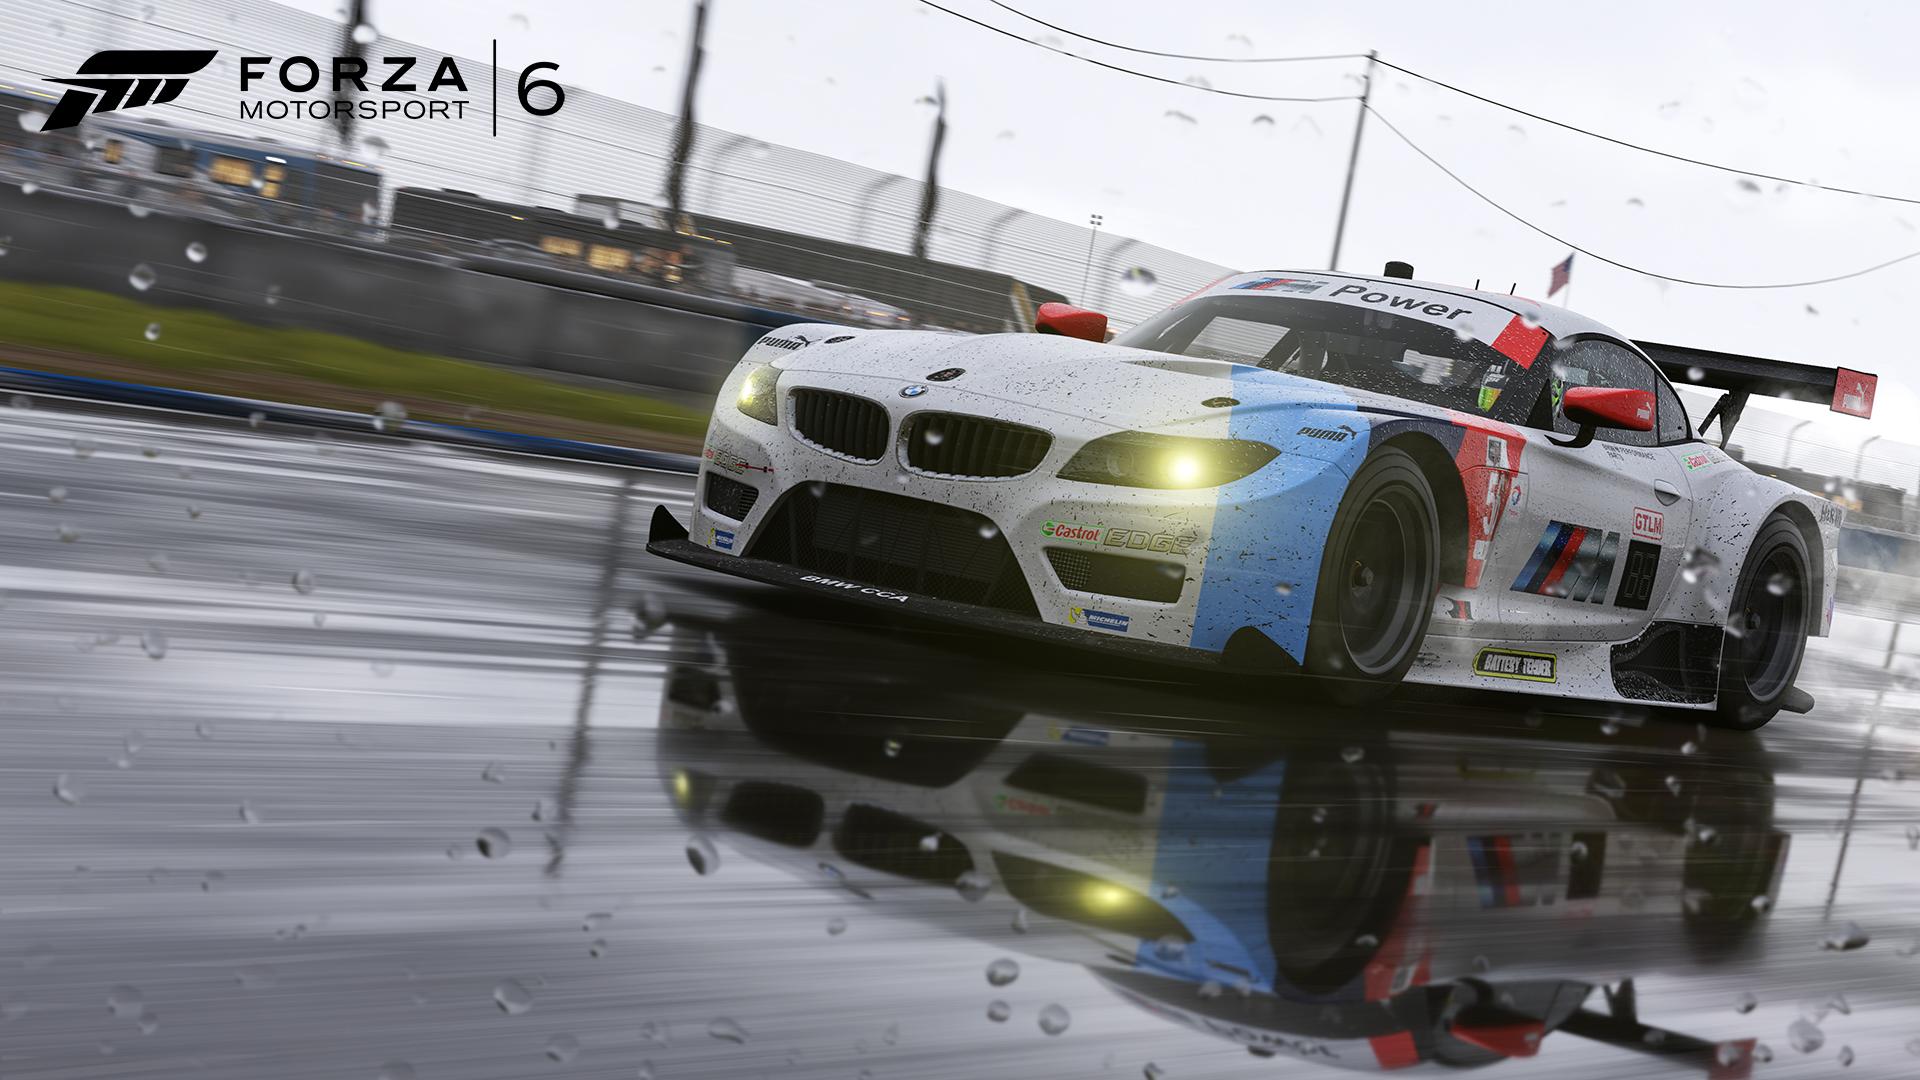 Forza Motorsport 6 Full Hd Papel De Parede And Planos De